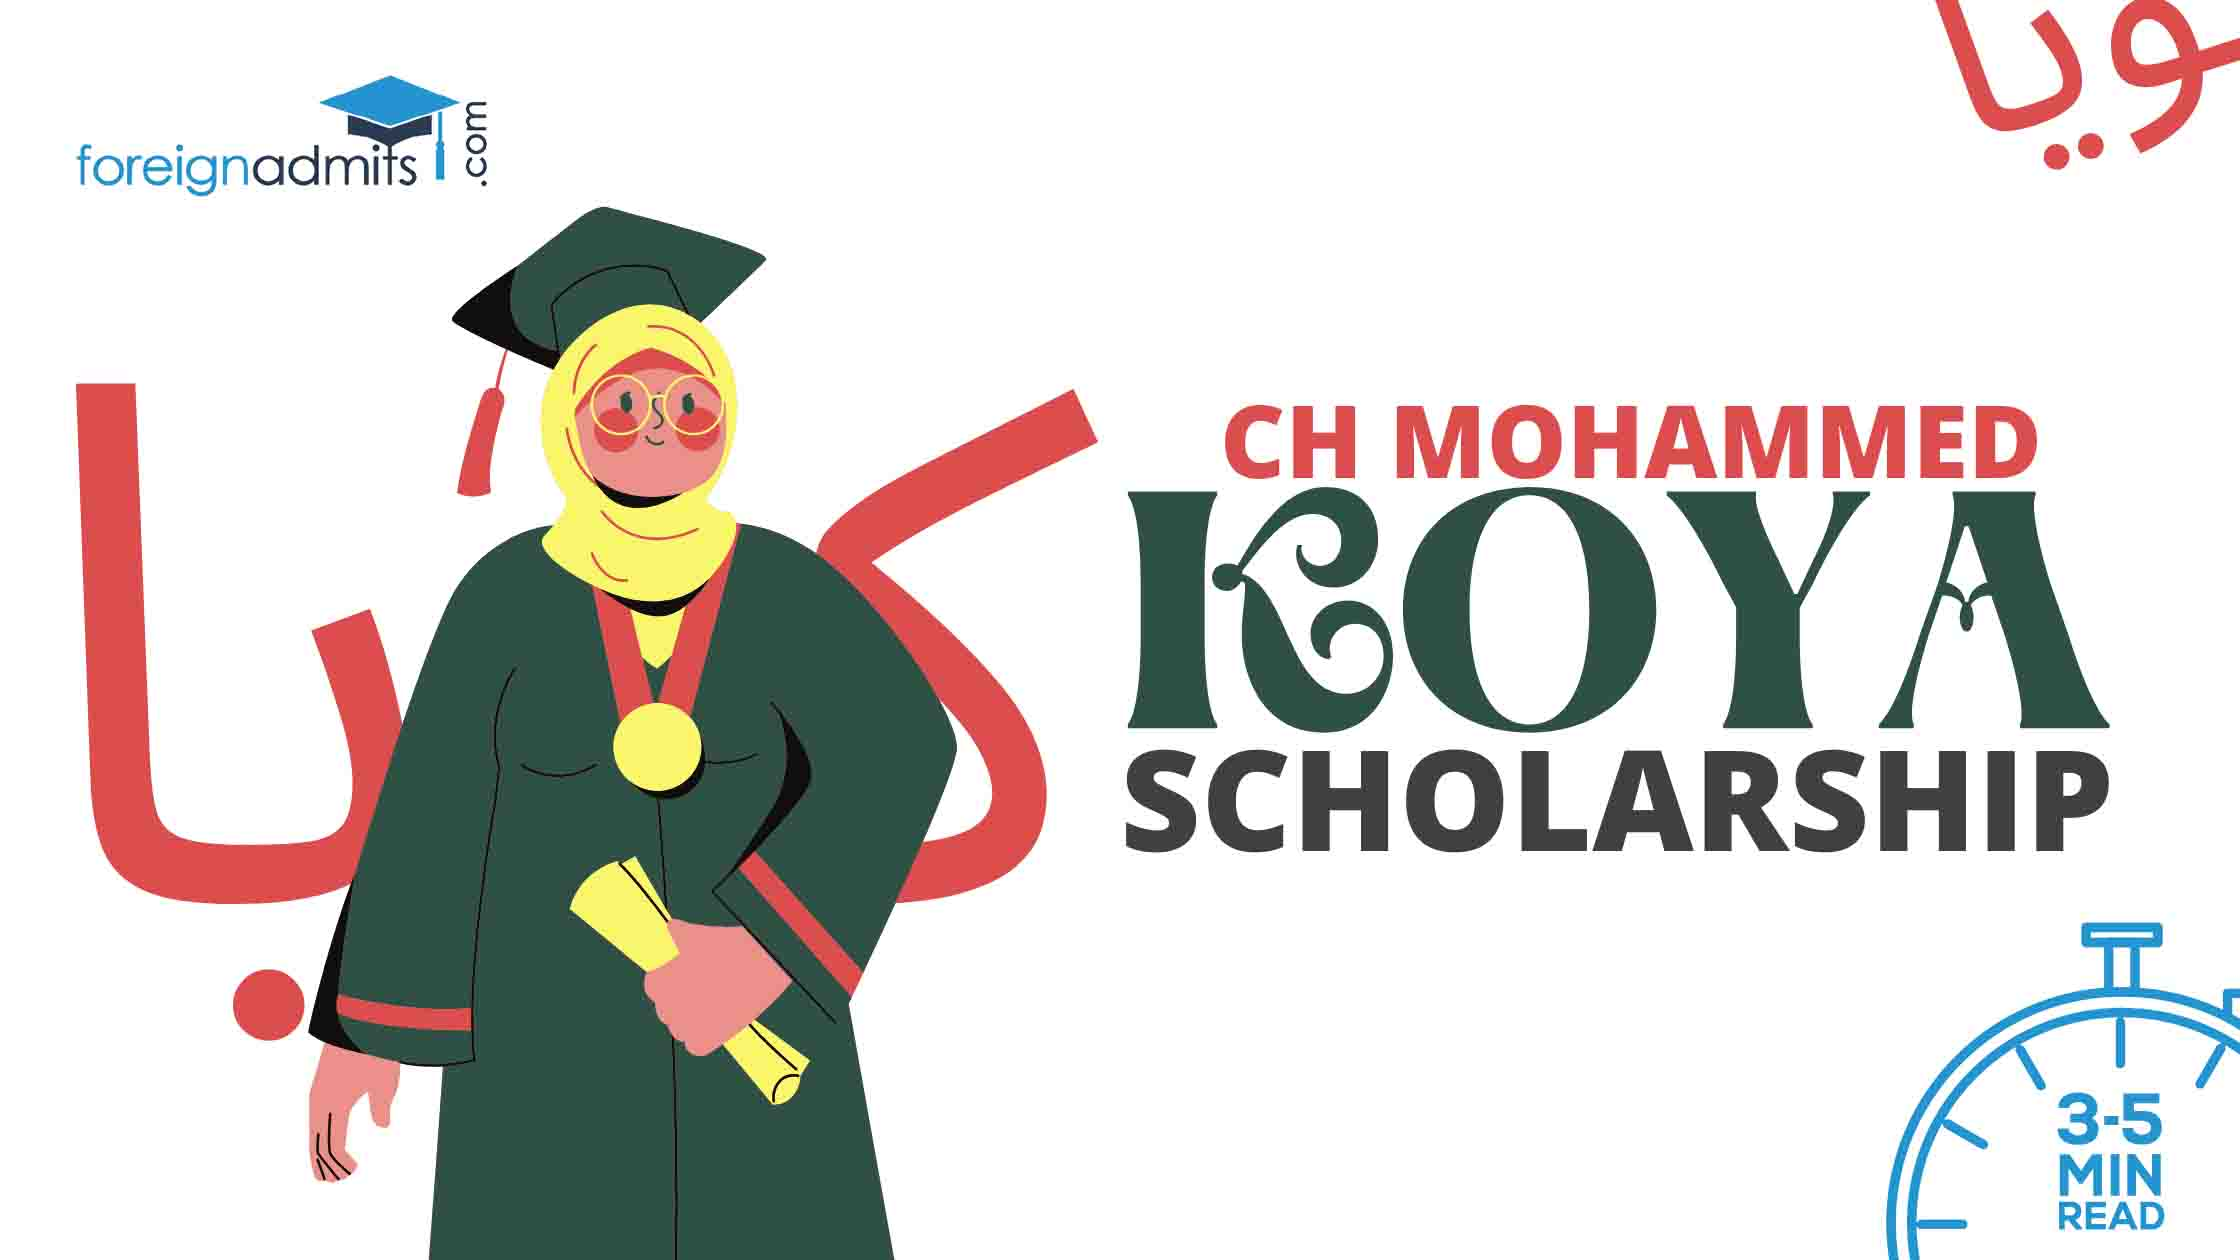 CH Mohammed Koya Scholarship